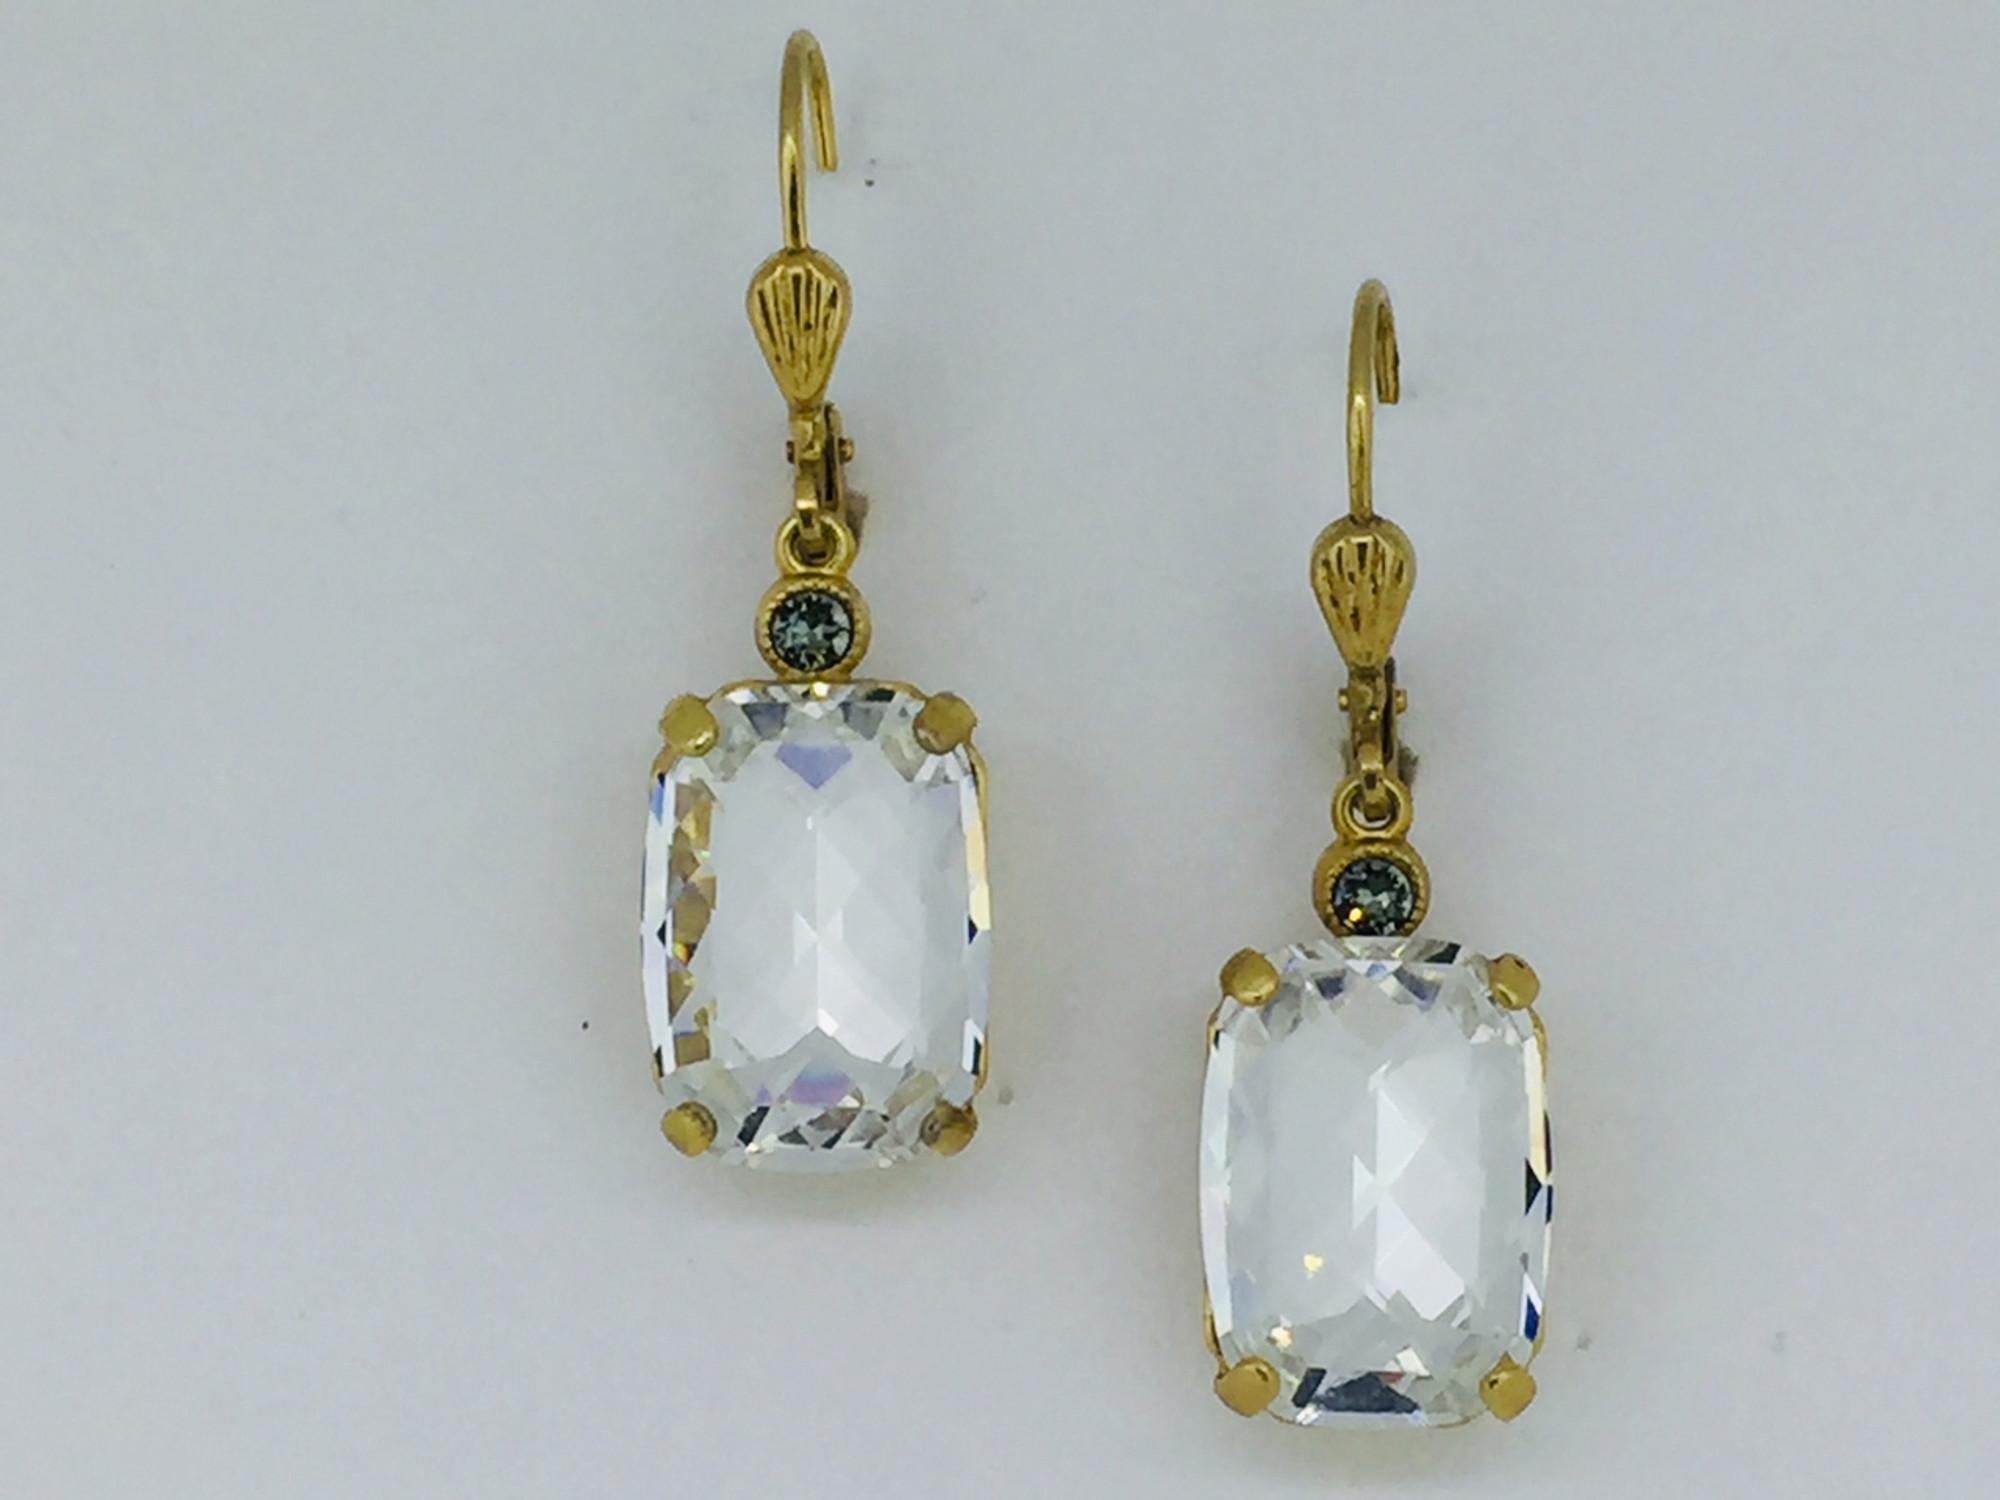 d344865f6 Gold Rectangle Clear Swarovski Crystal Earrings - Mima's Of Warwick, LLC